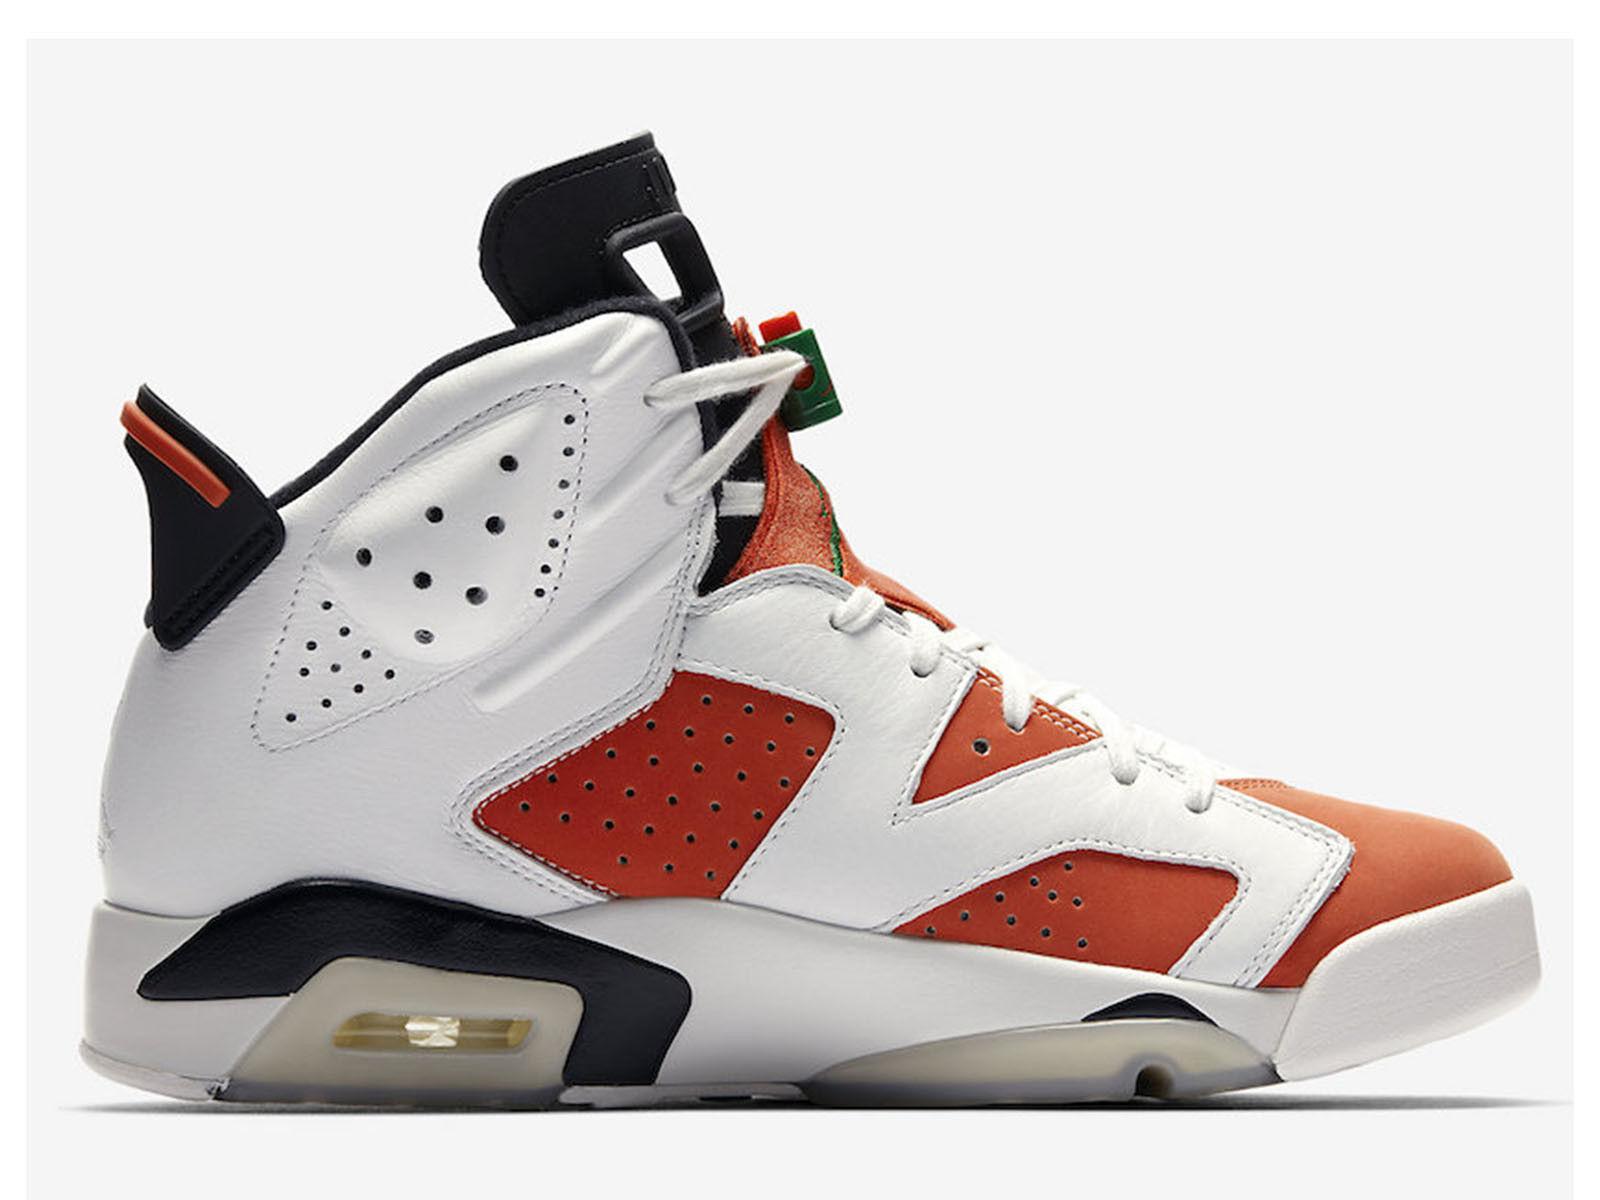 Men's Brand New Air Jordan 6 Retro  GATORADE  Fashion Sneakers